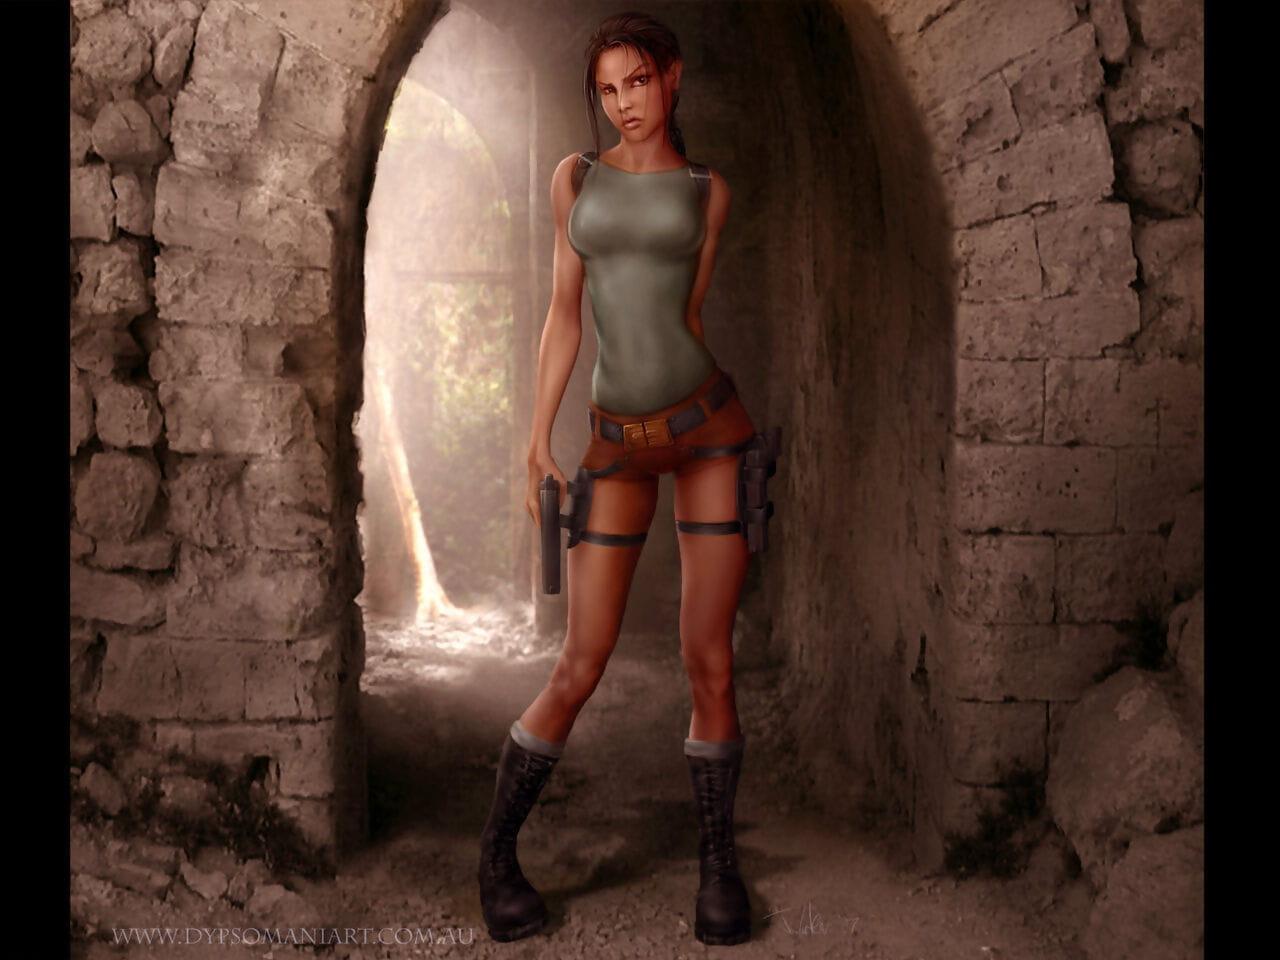 Lara Croft - Mausoleum raider Tread be advisable for E - Hentai - decoration 5